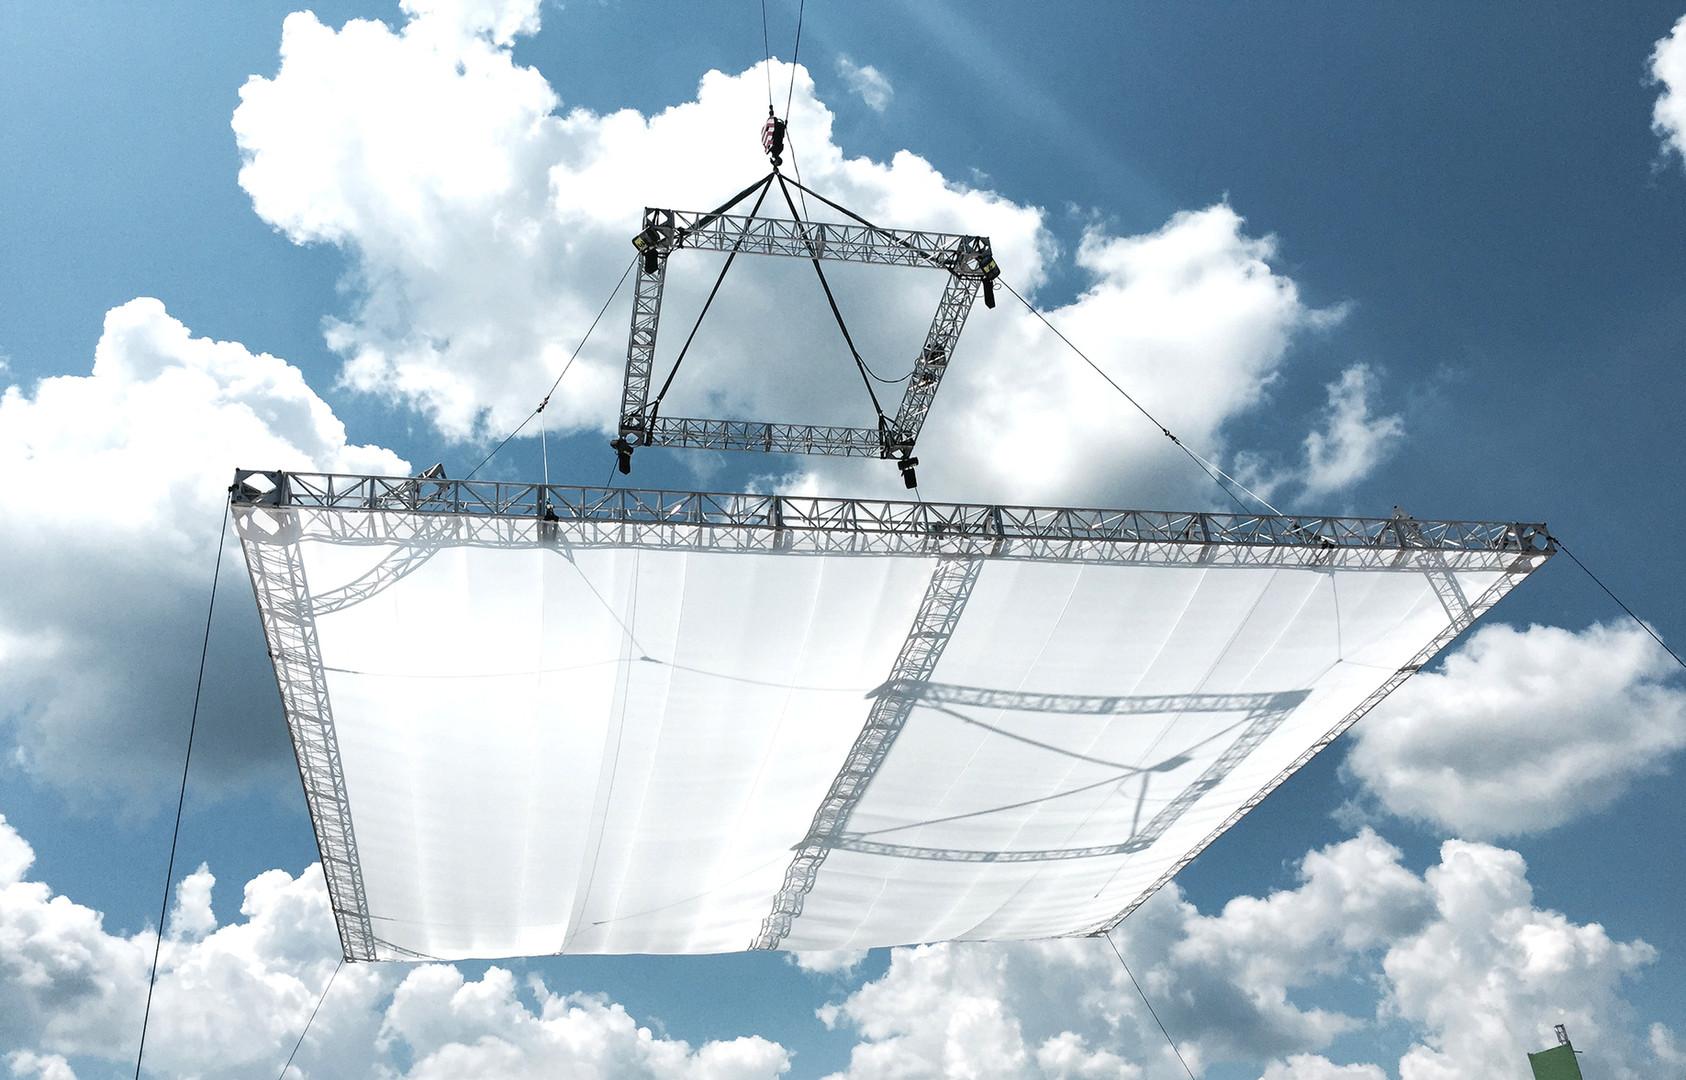 Overhead Diffusion Frames